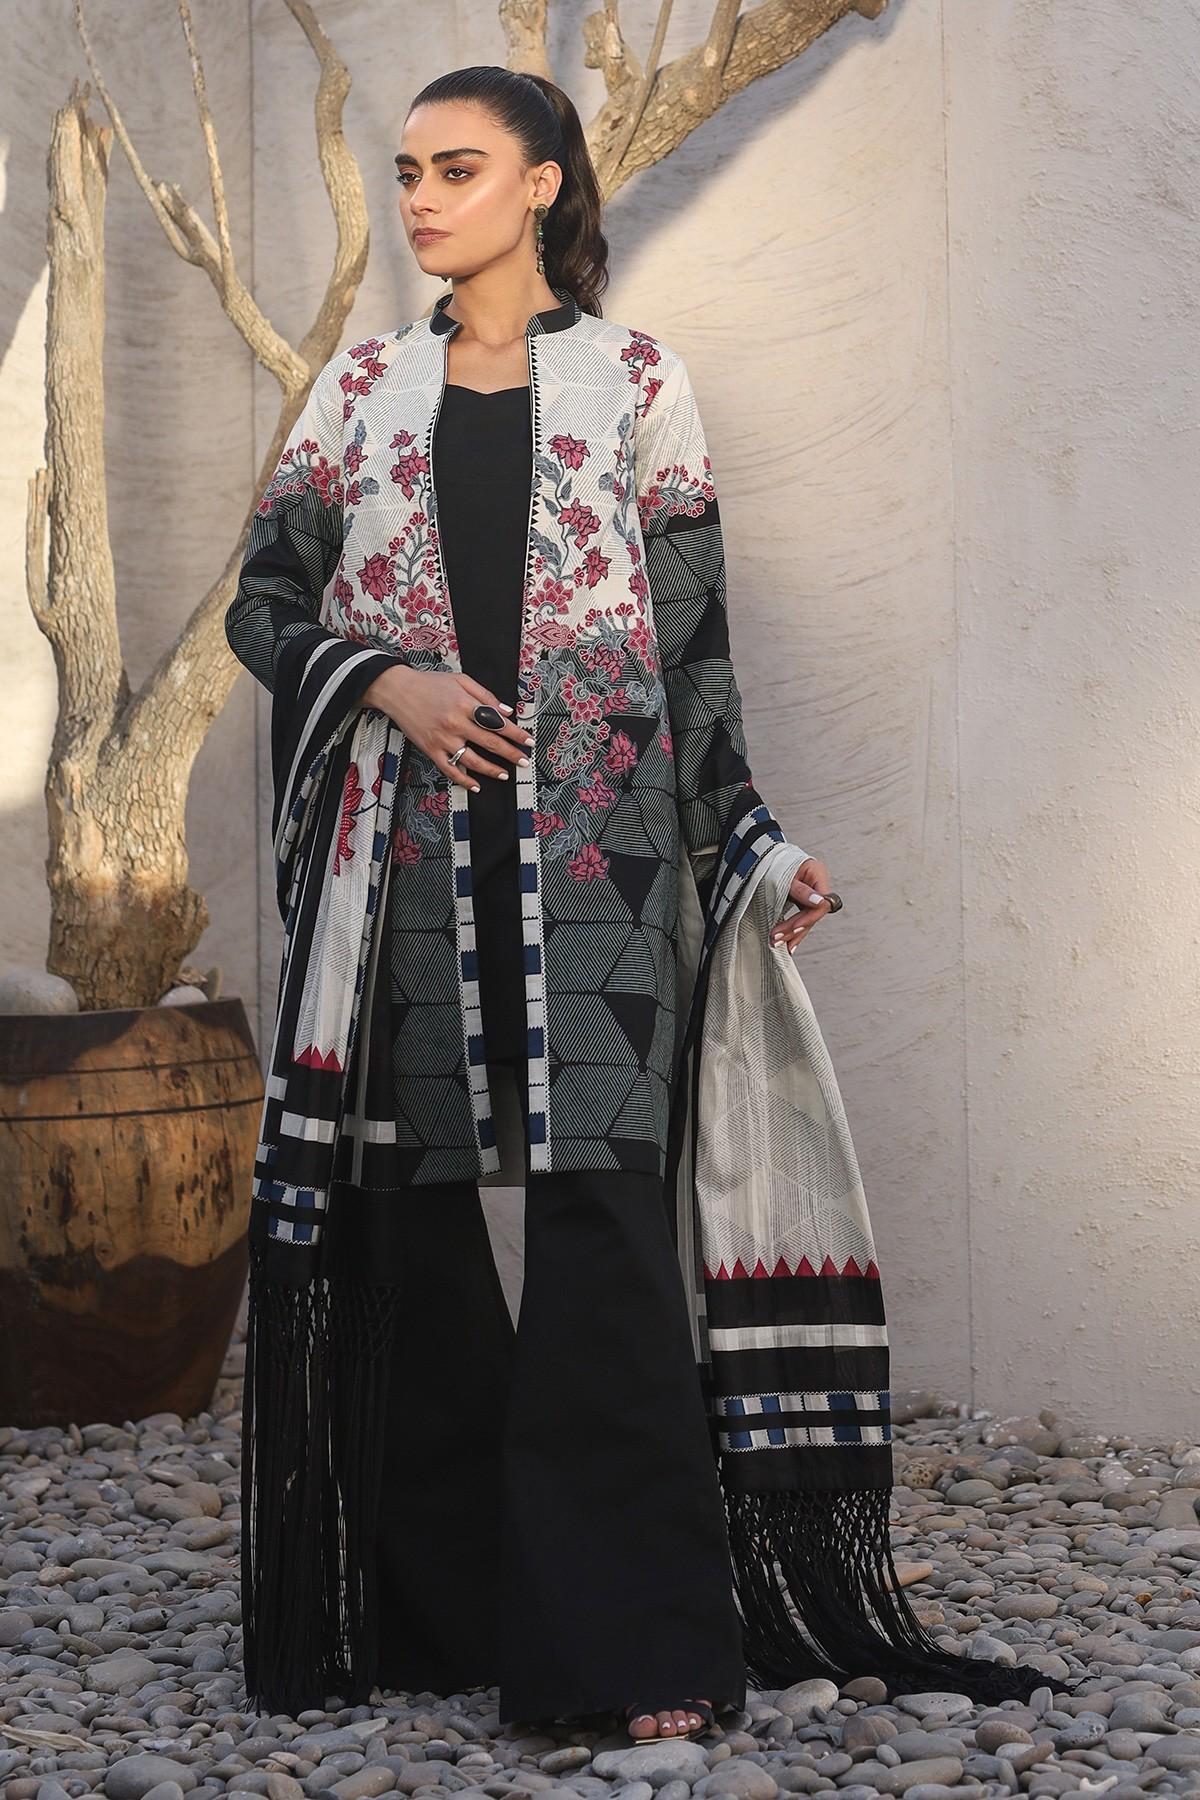 Al-Akaram winter collection Black colorThree Piece Printed Suit With Brochia Dupatta